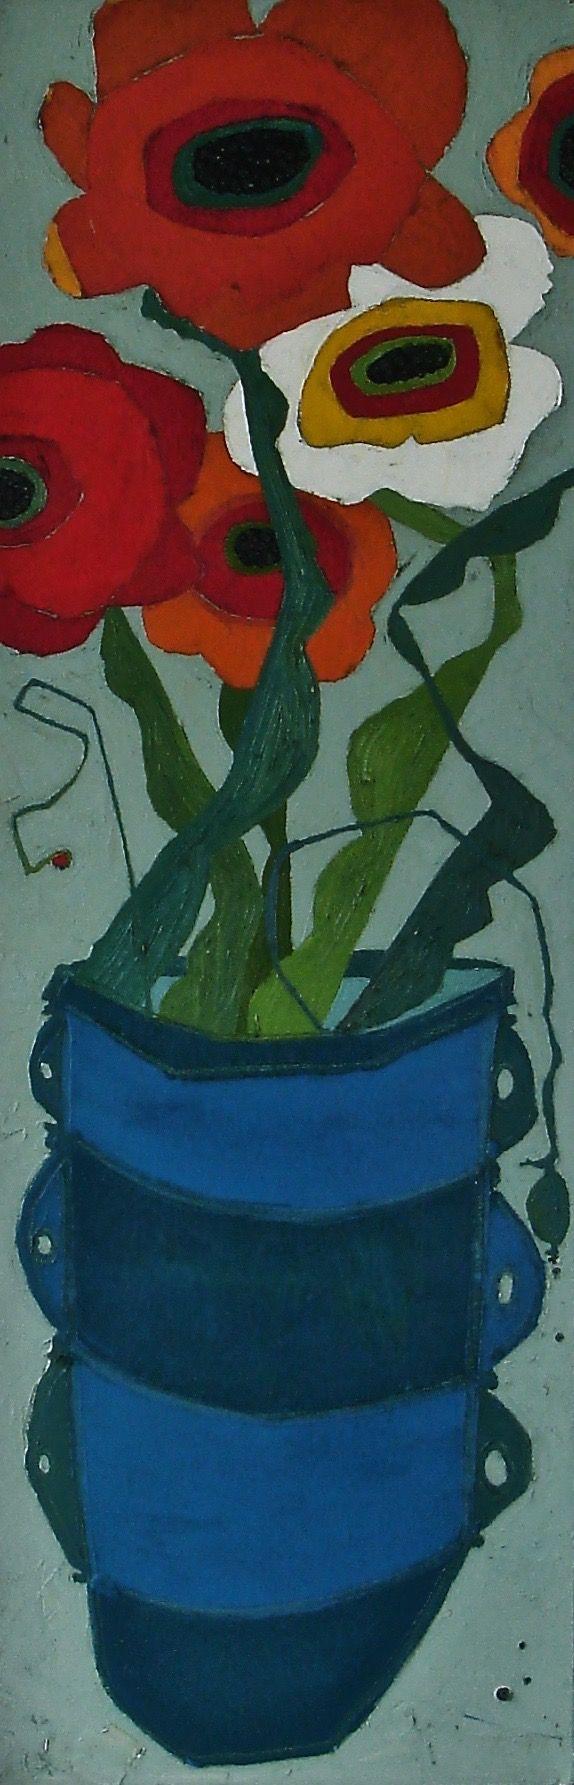 "Poppies for the Table by Karen Tusinski, 36x12"", oil"